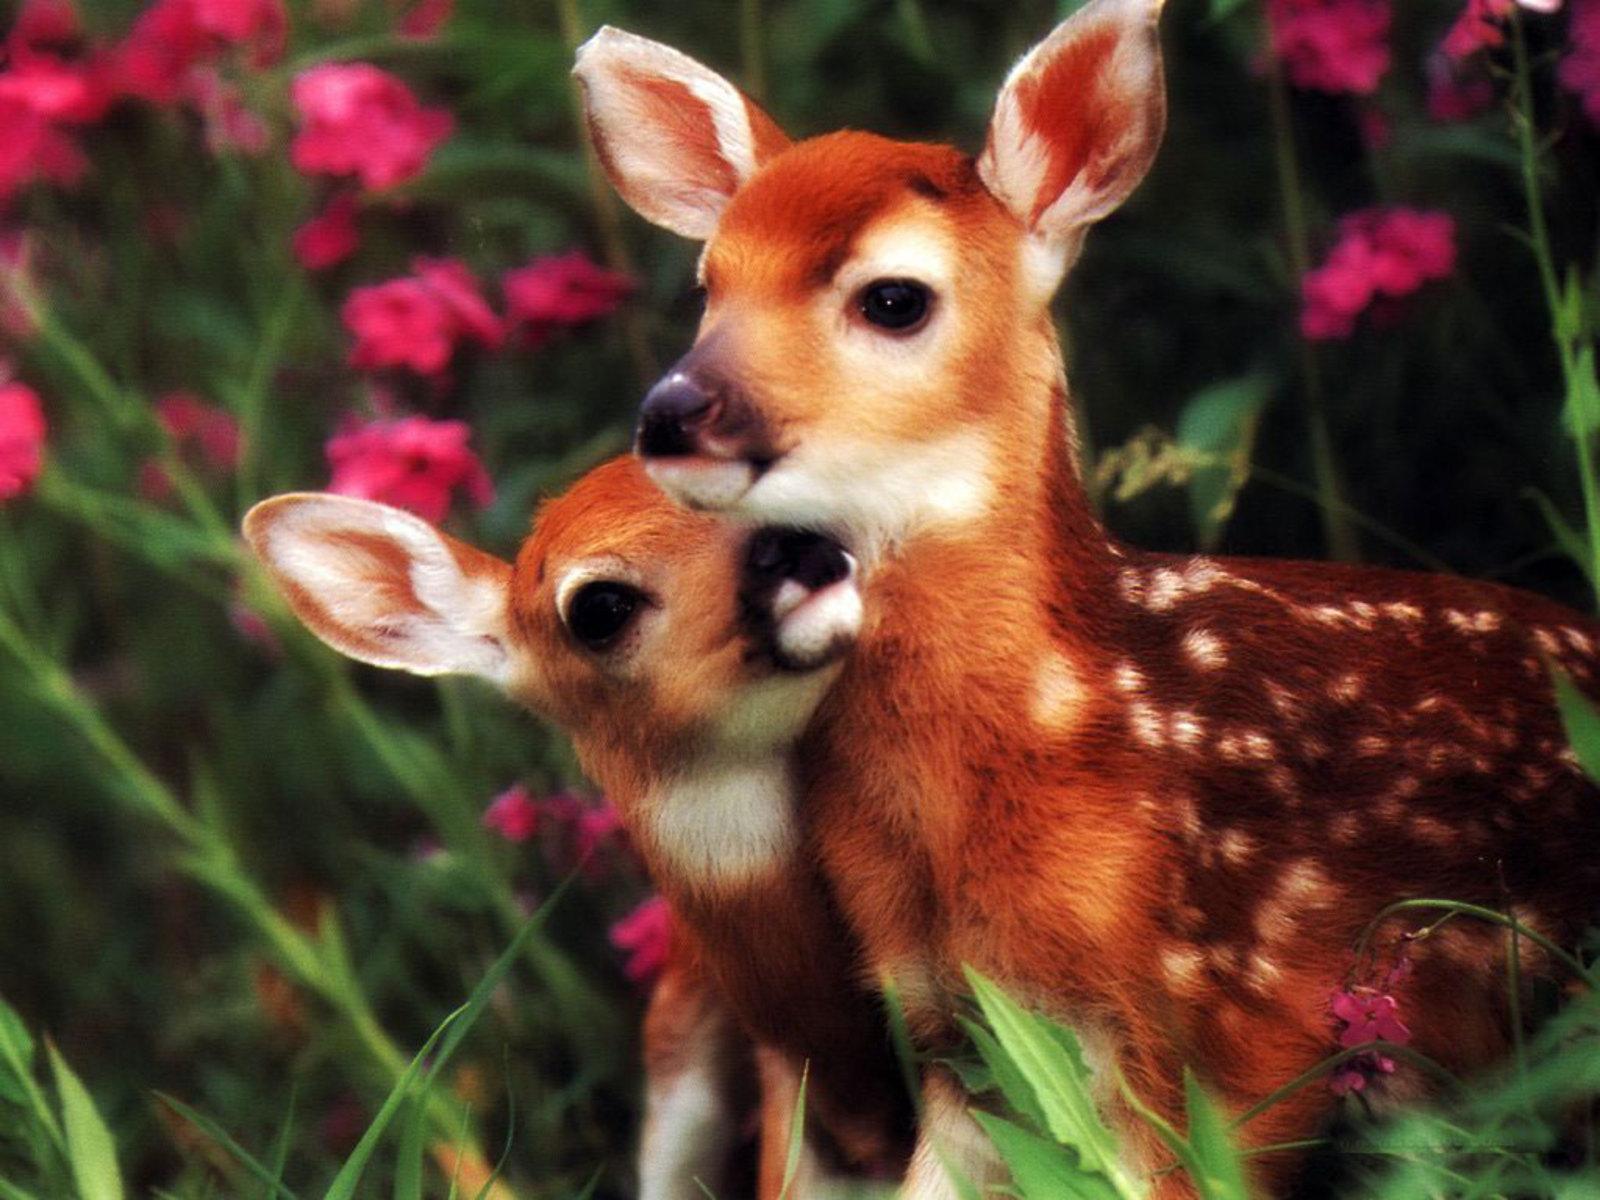 http://4.bp.blogspot.com/_EAViqbzwc_s/TN_QE97ayQI/AAAAAAAACCU/KxeVPjtpXCo/s1600/mom-n-baby.jpg